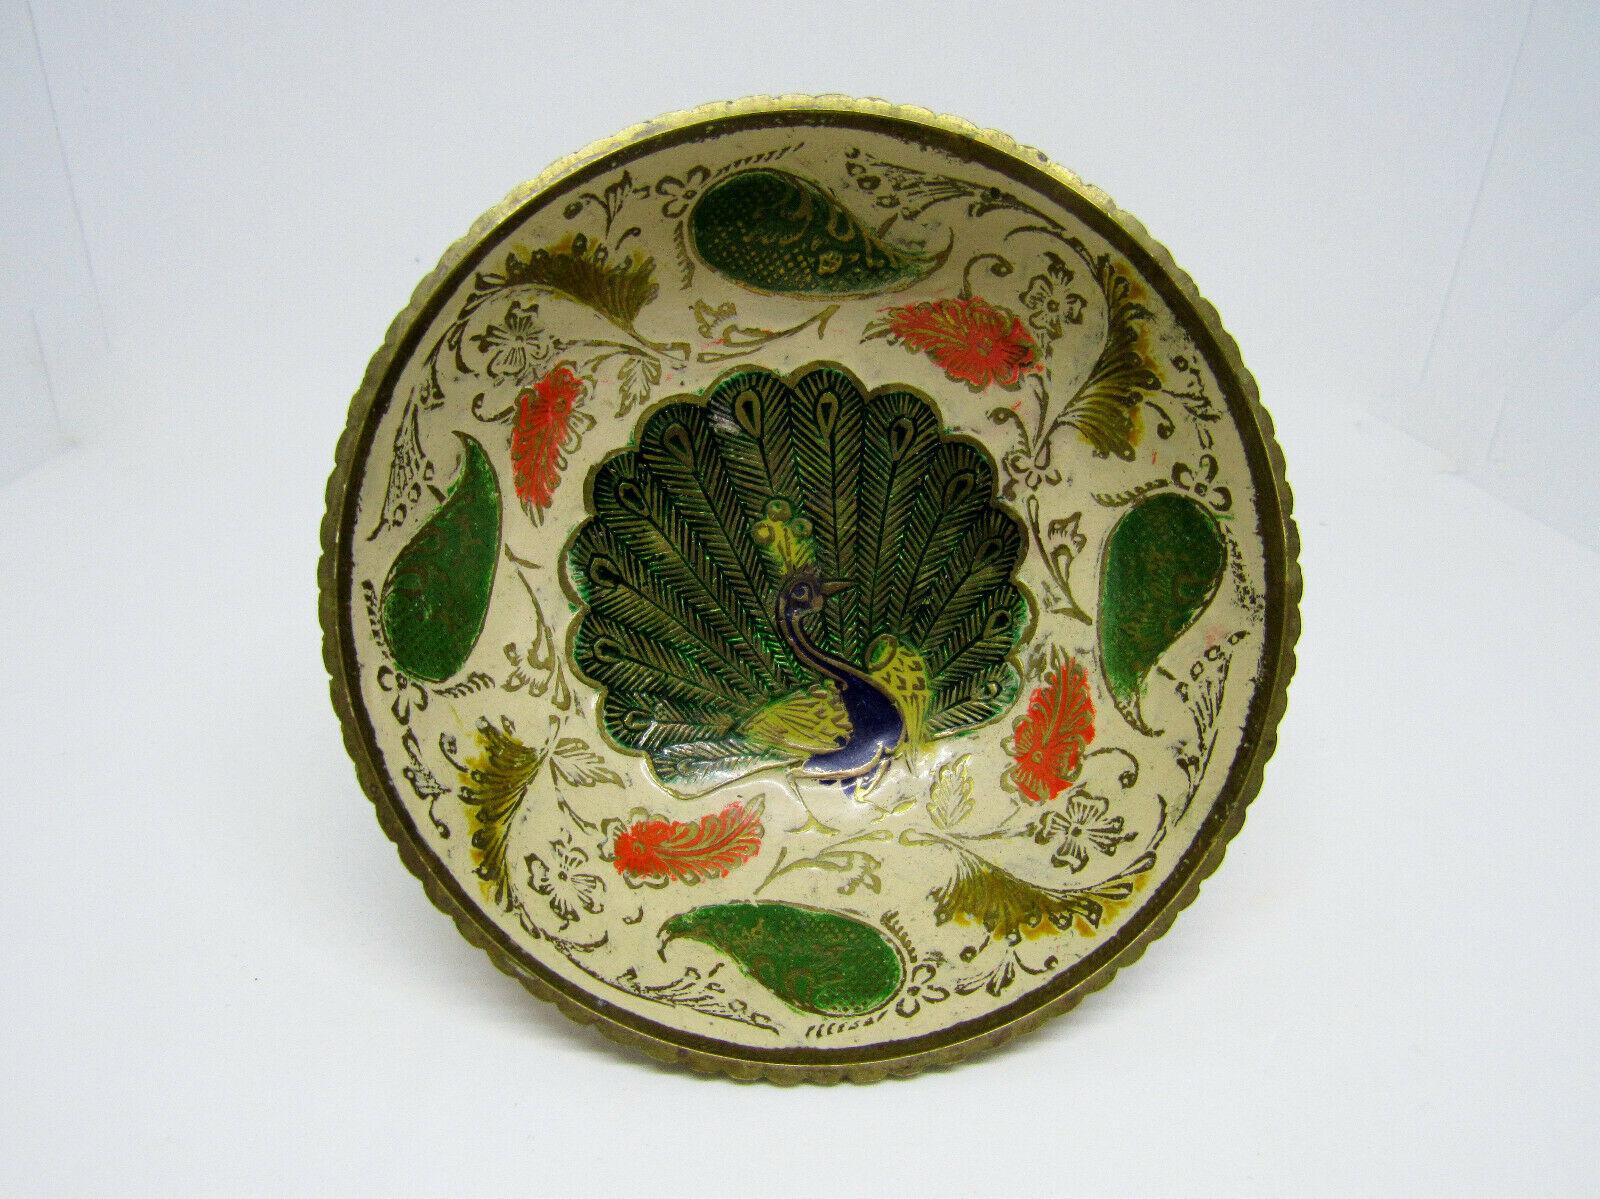 Vintage Brass Ornate Peacock Enameled Bowl on Pedestal